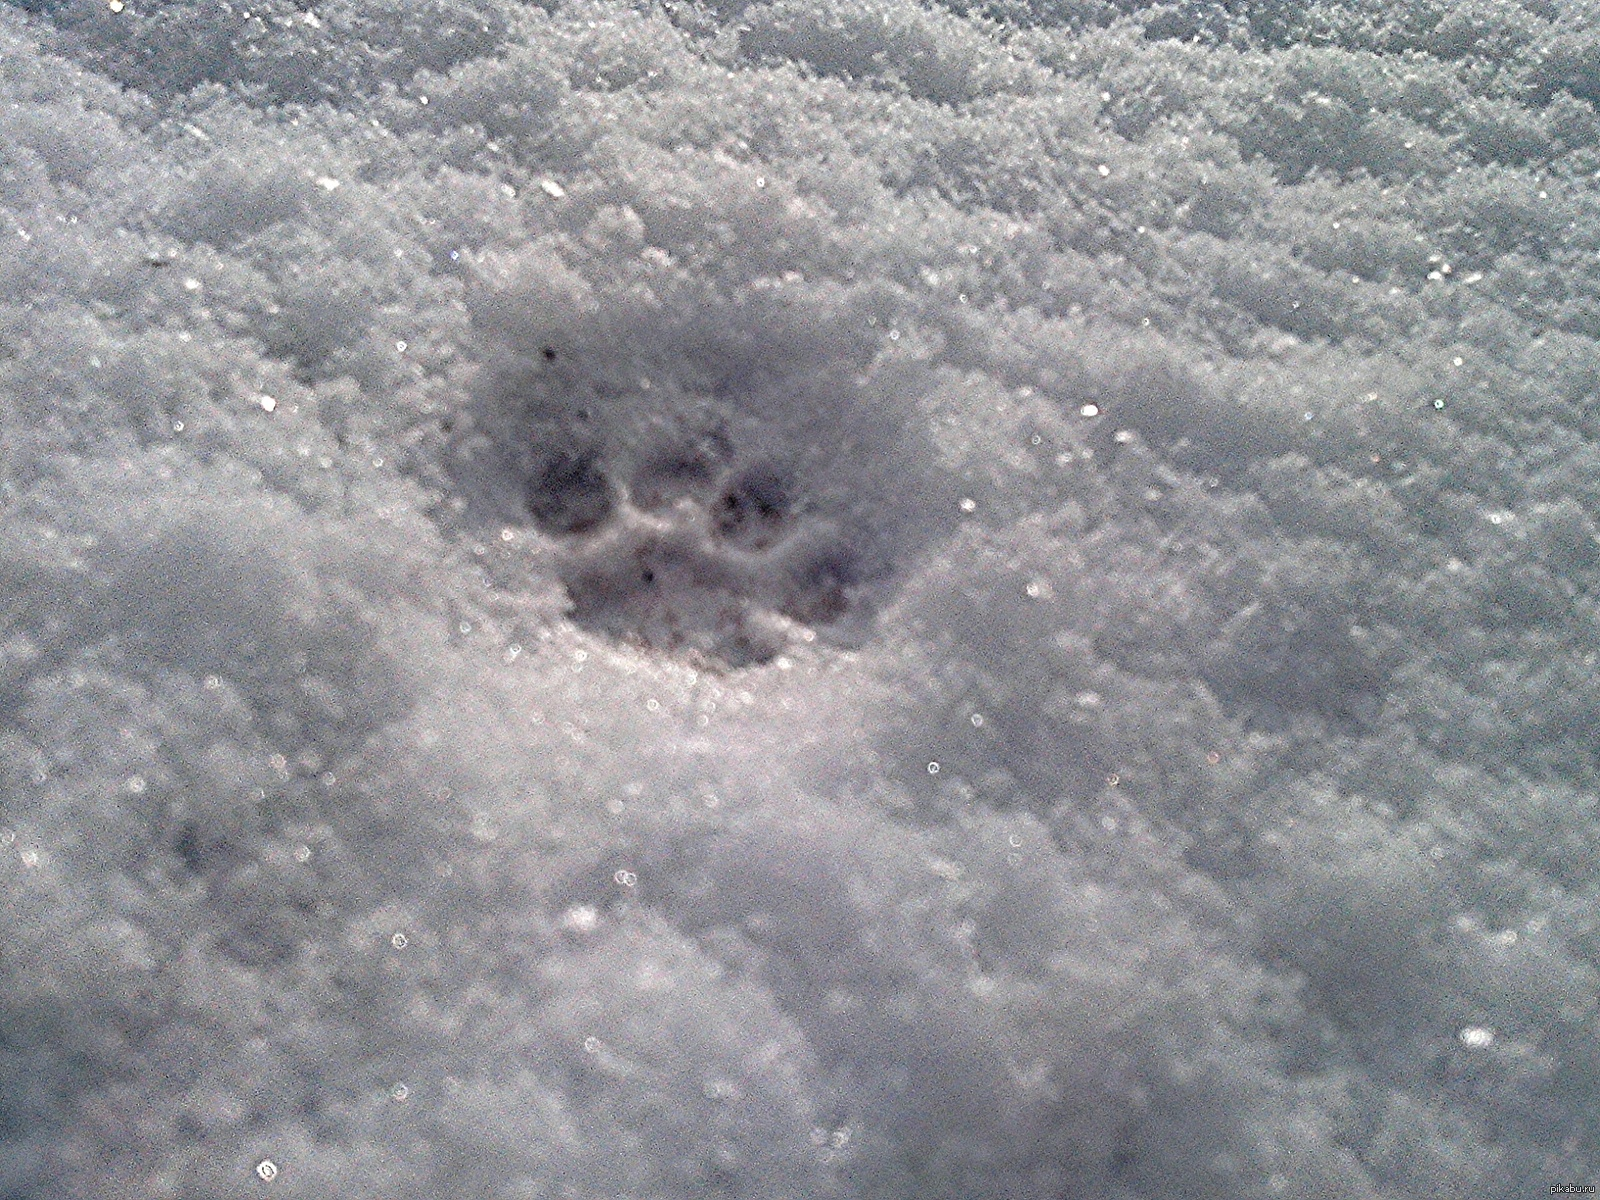 них следы рыси на снегу фото одном